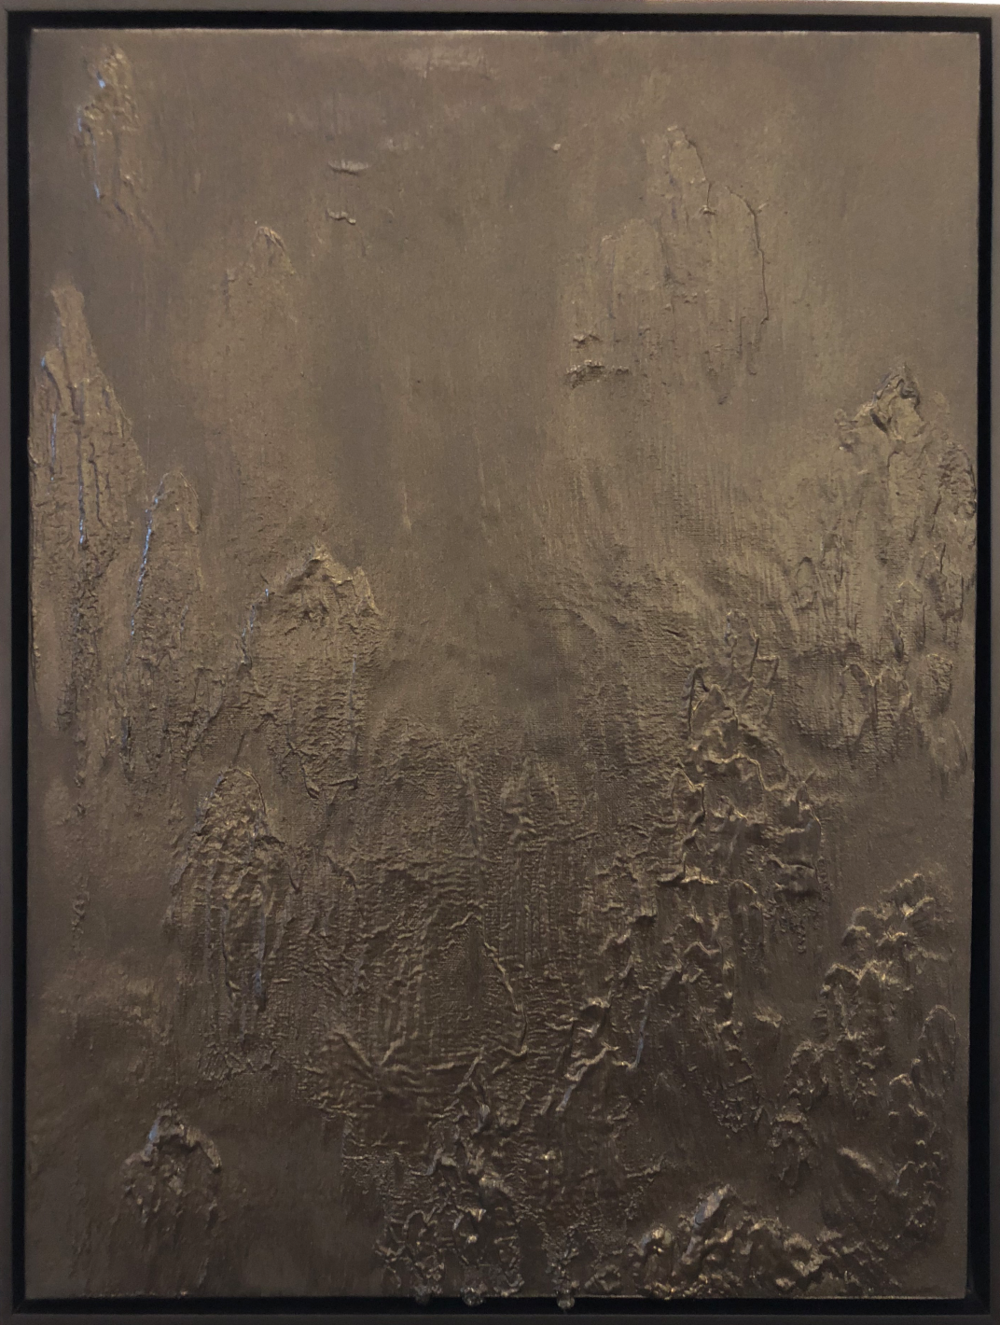 Matthew C. Metzger, American Darkness I  Oil, Iron & Bronze on Canvas, 25x19 in.